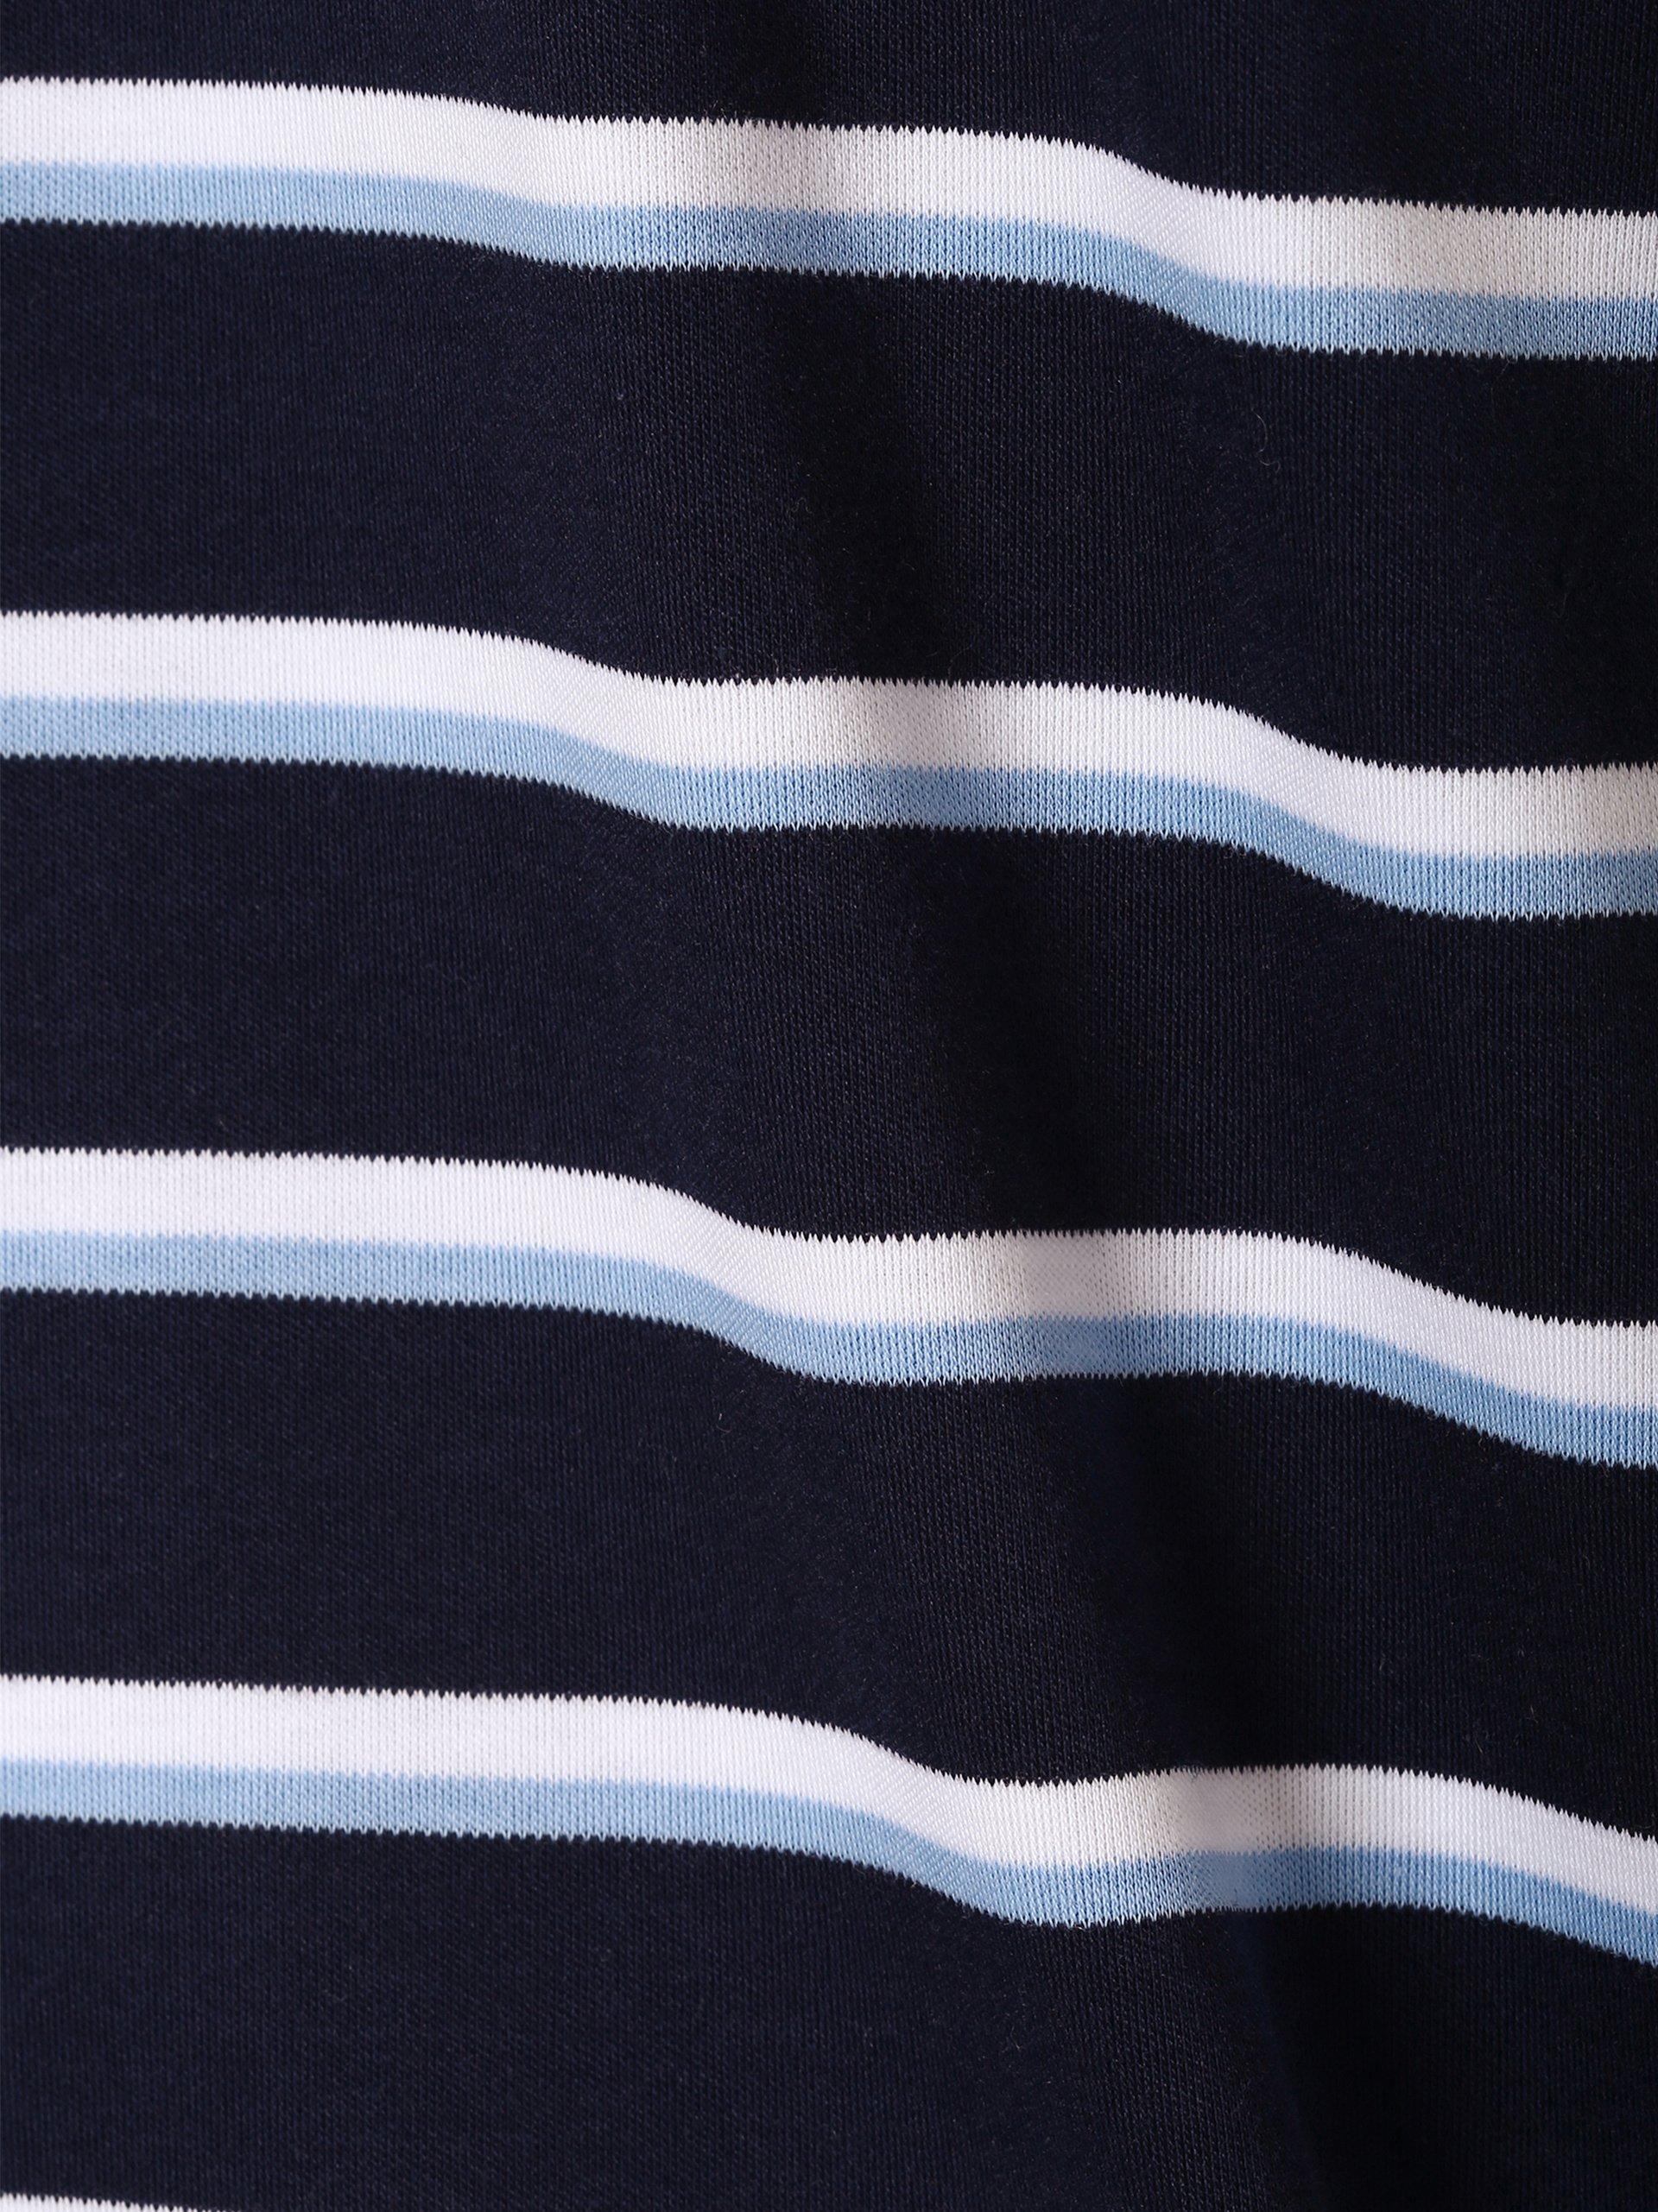 Polo Ralph Lauren Herren Poloshirt - Slim Fit